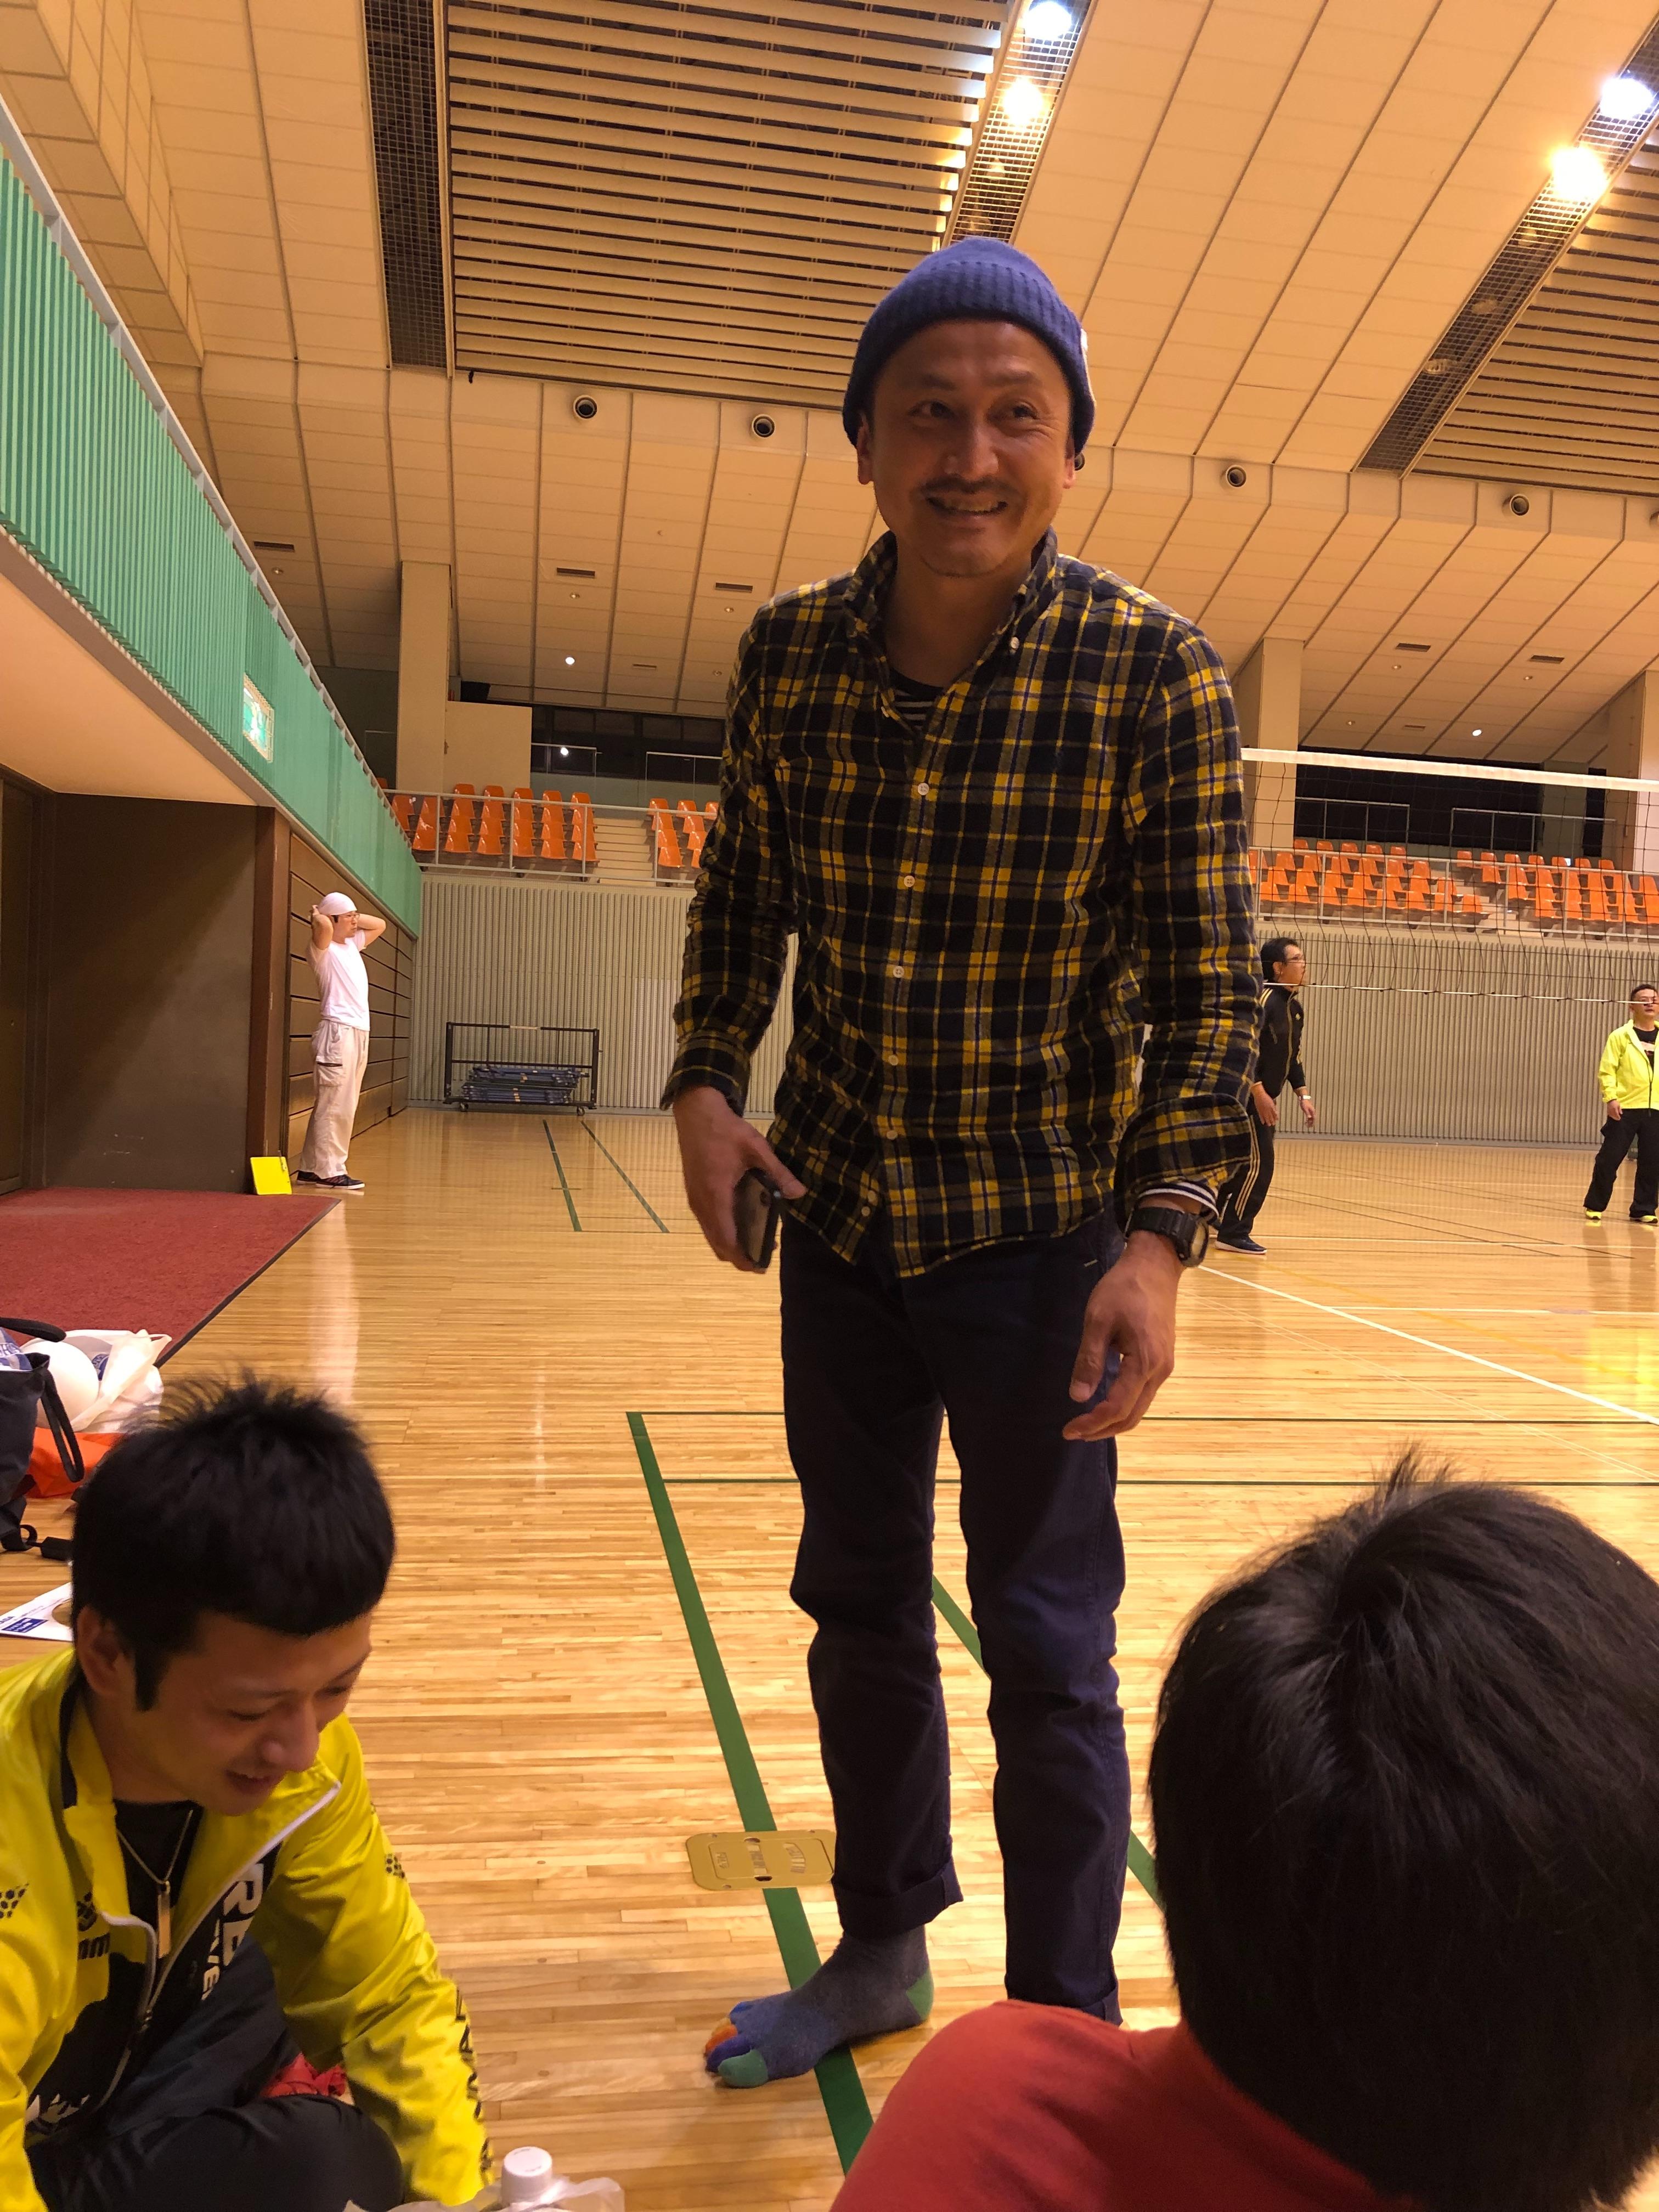 f:id:masanori-kato1972:20190322110826j:image